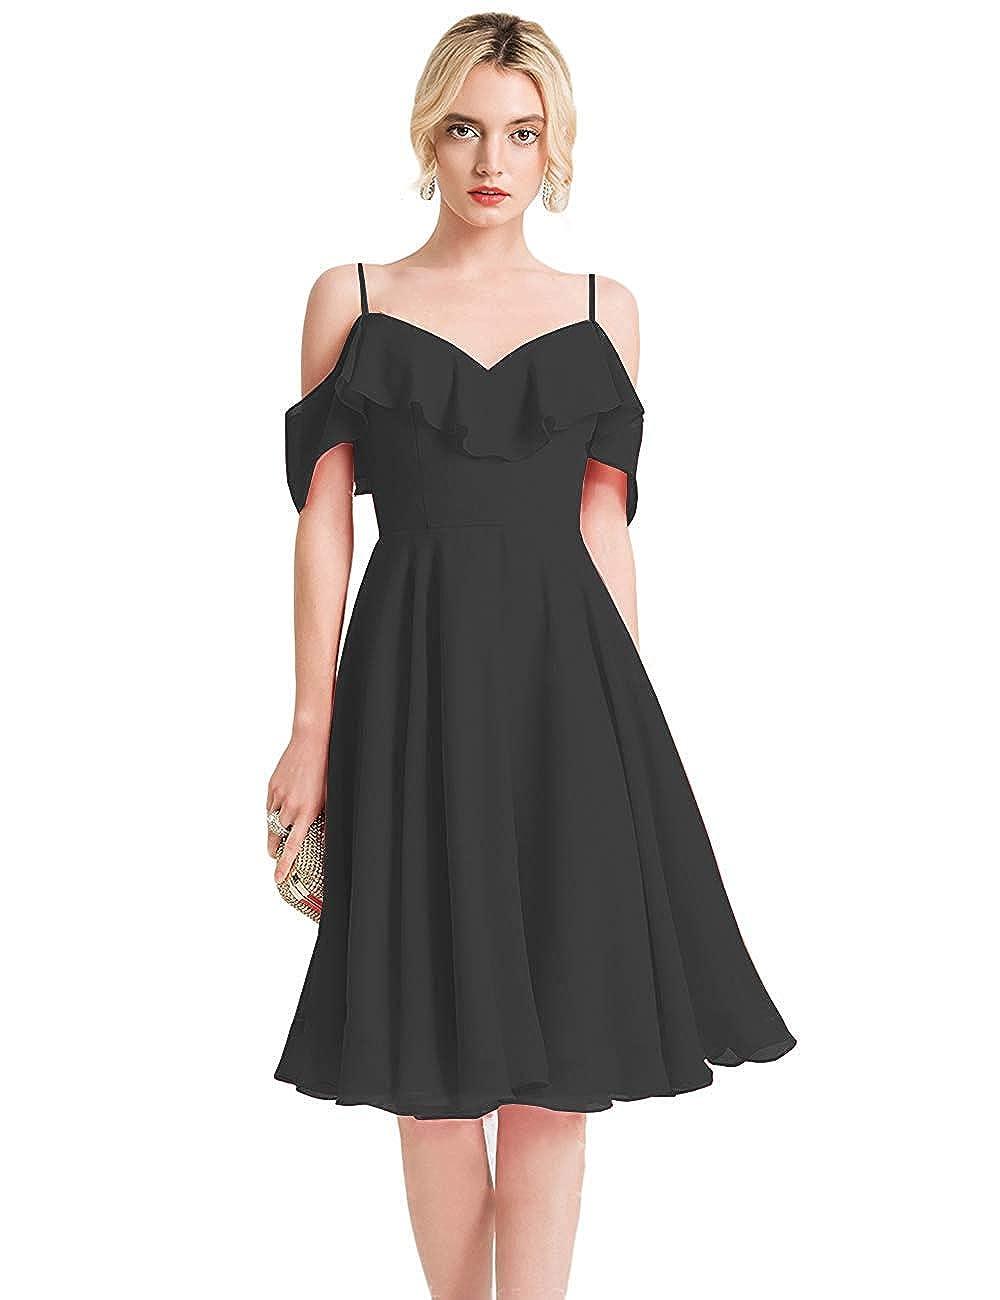 BlackB FeiYueXinXing VNeck Ruffled Spaghetti Strap Prom Dresses Long Formal Evening Gown